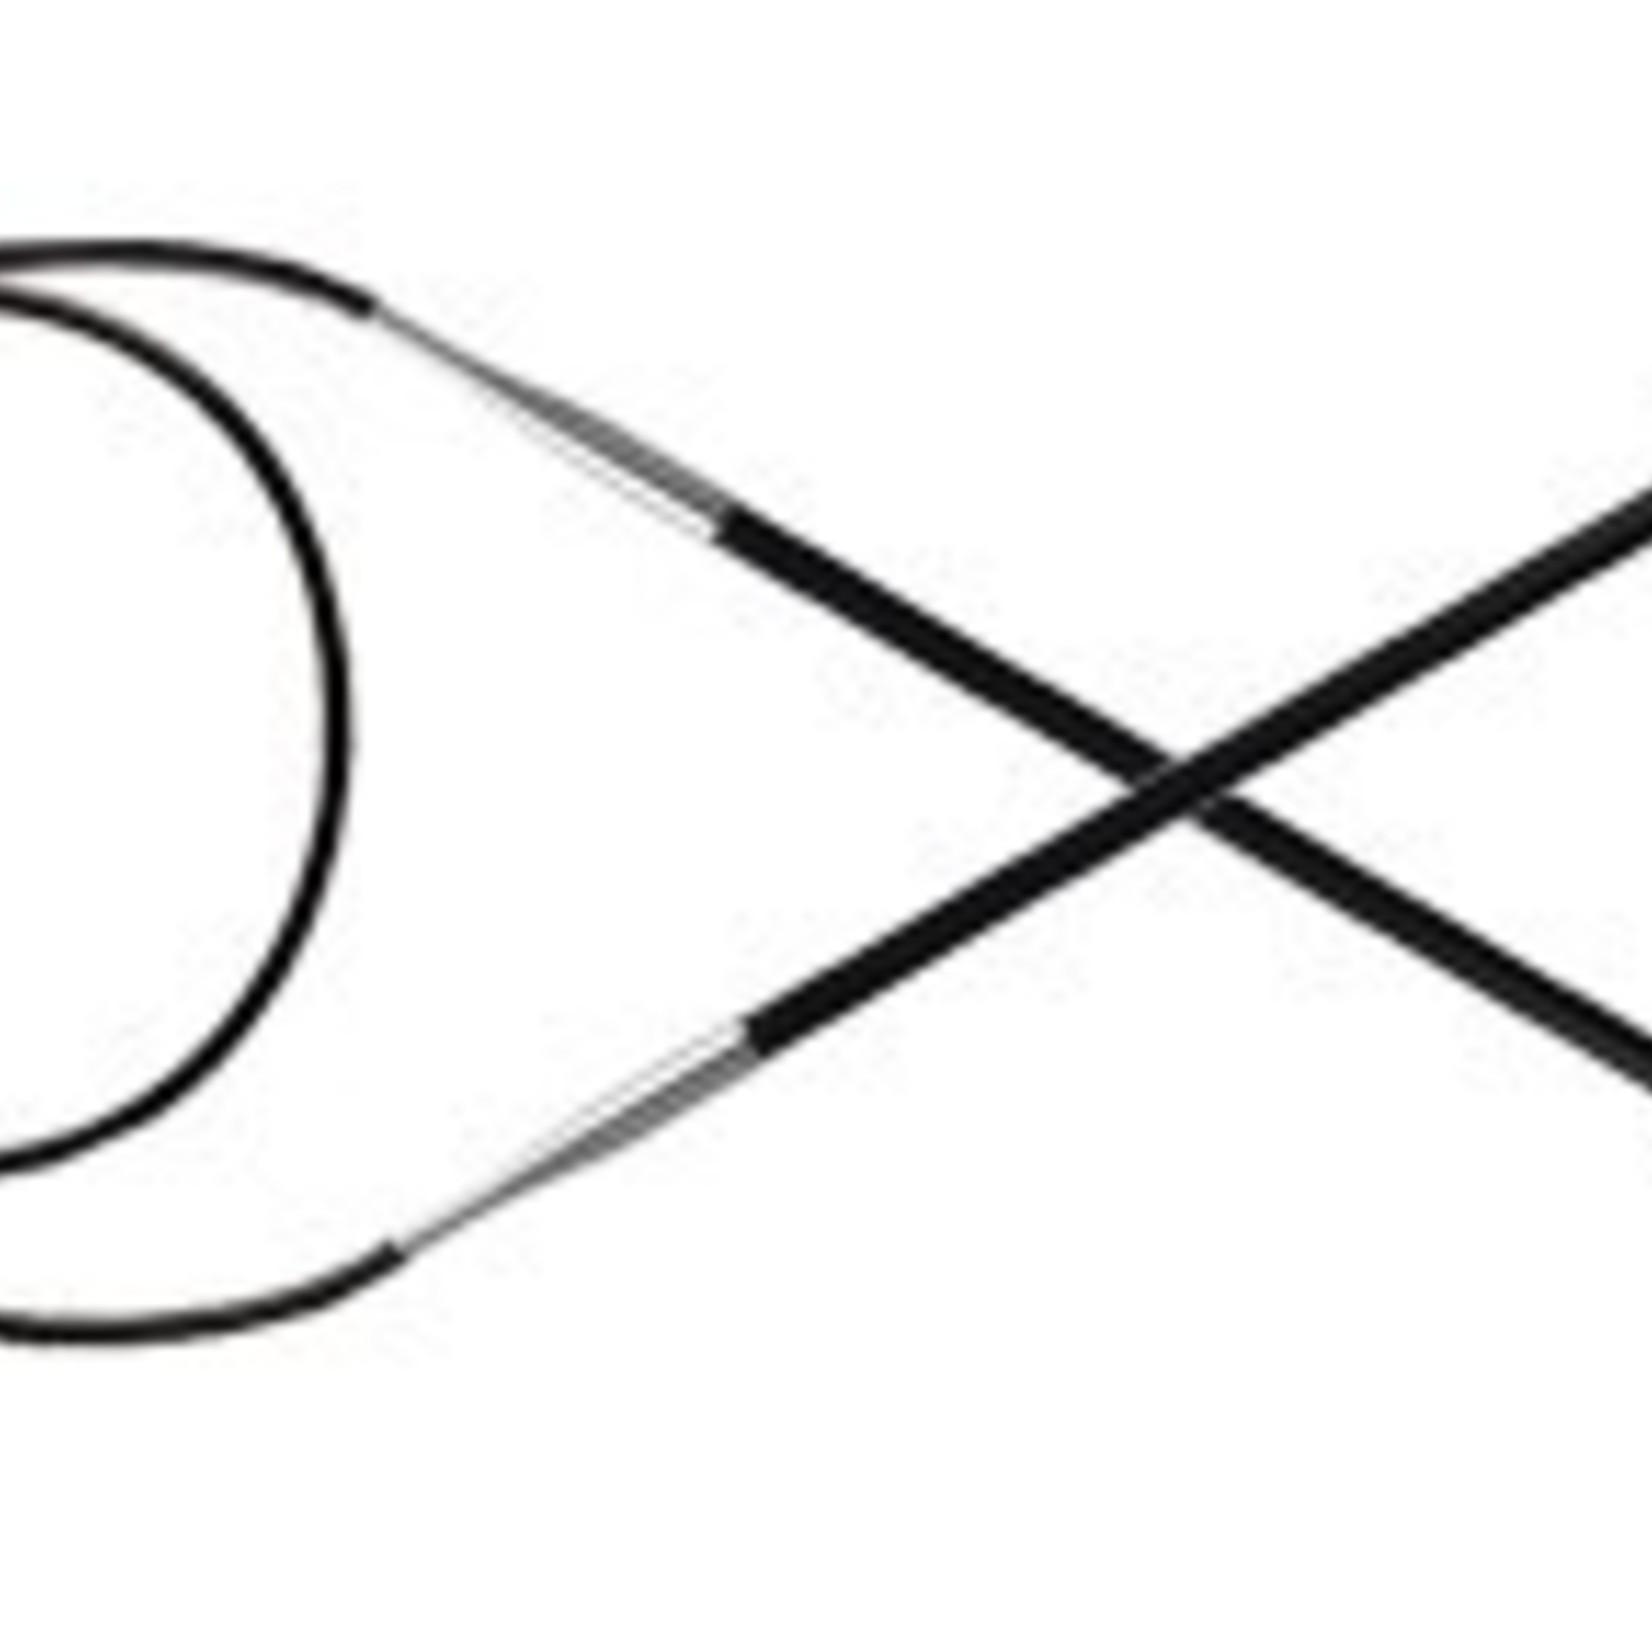 Knitter's Pride 5 Karbonz Circular 40